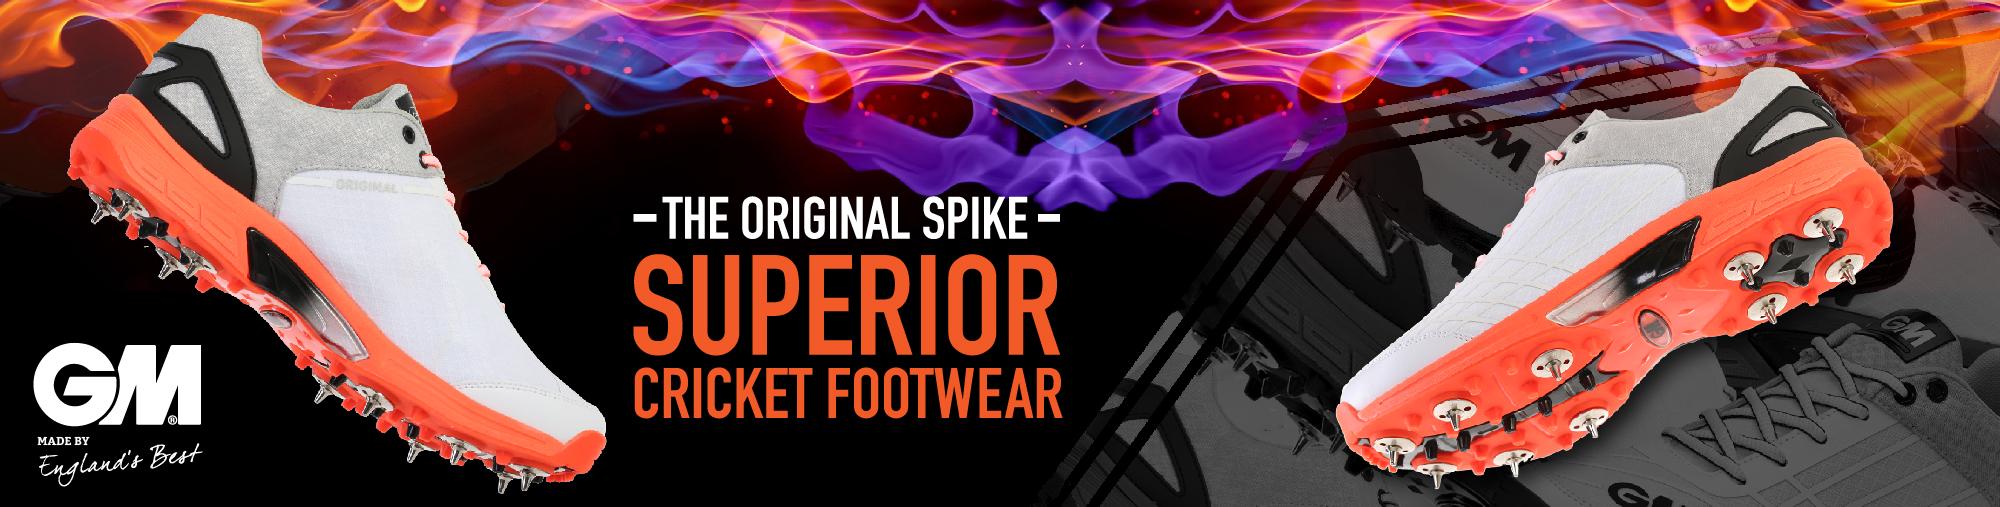 spike-shoe.jpg